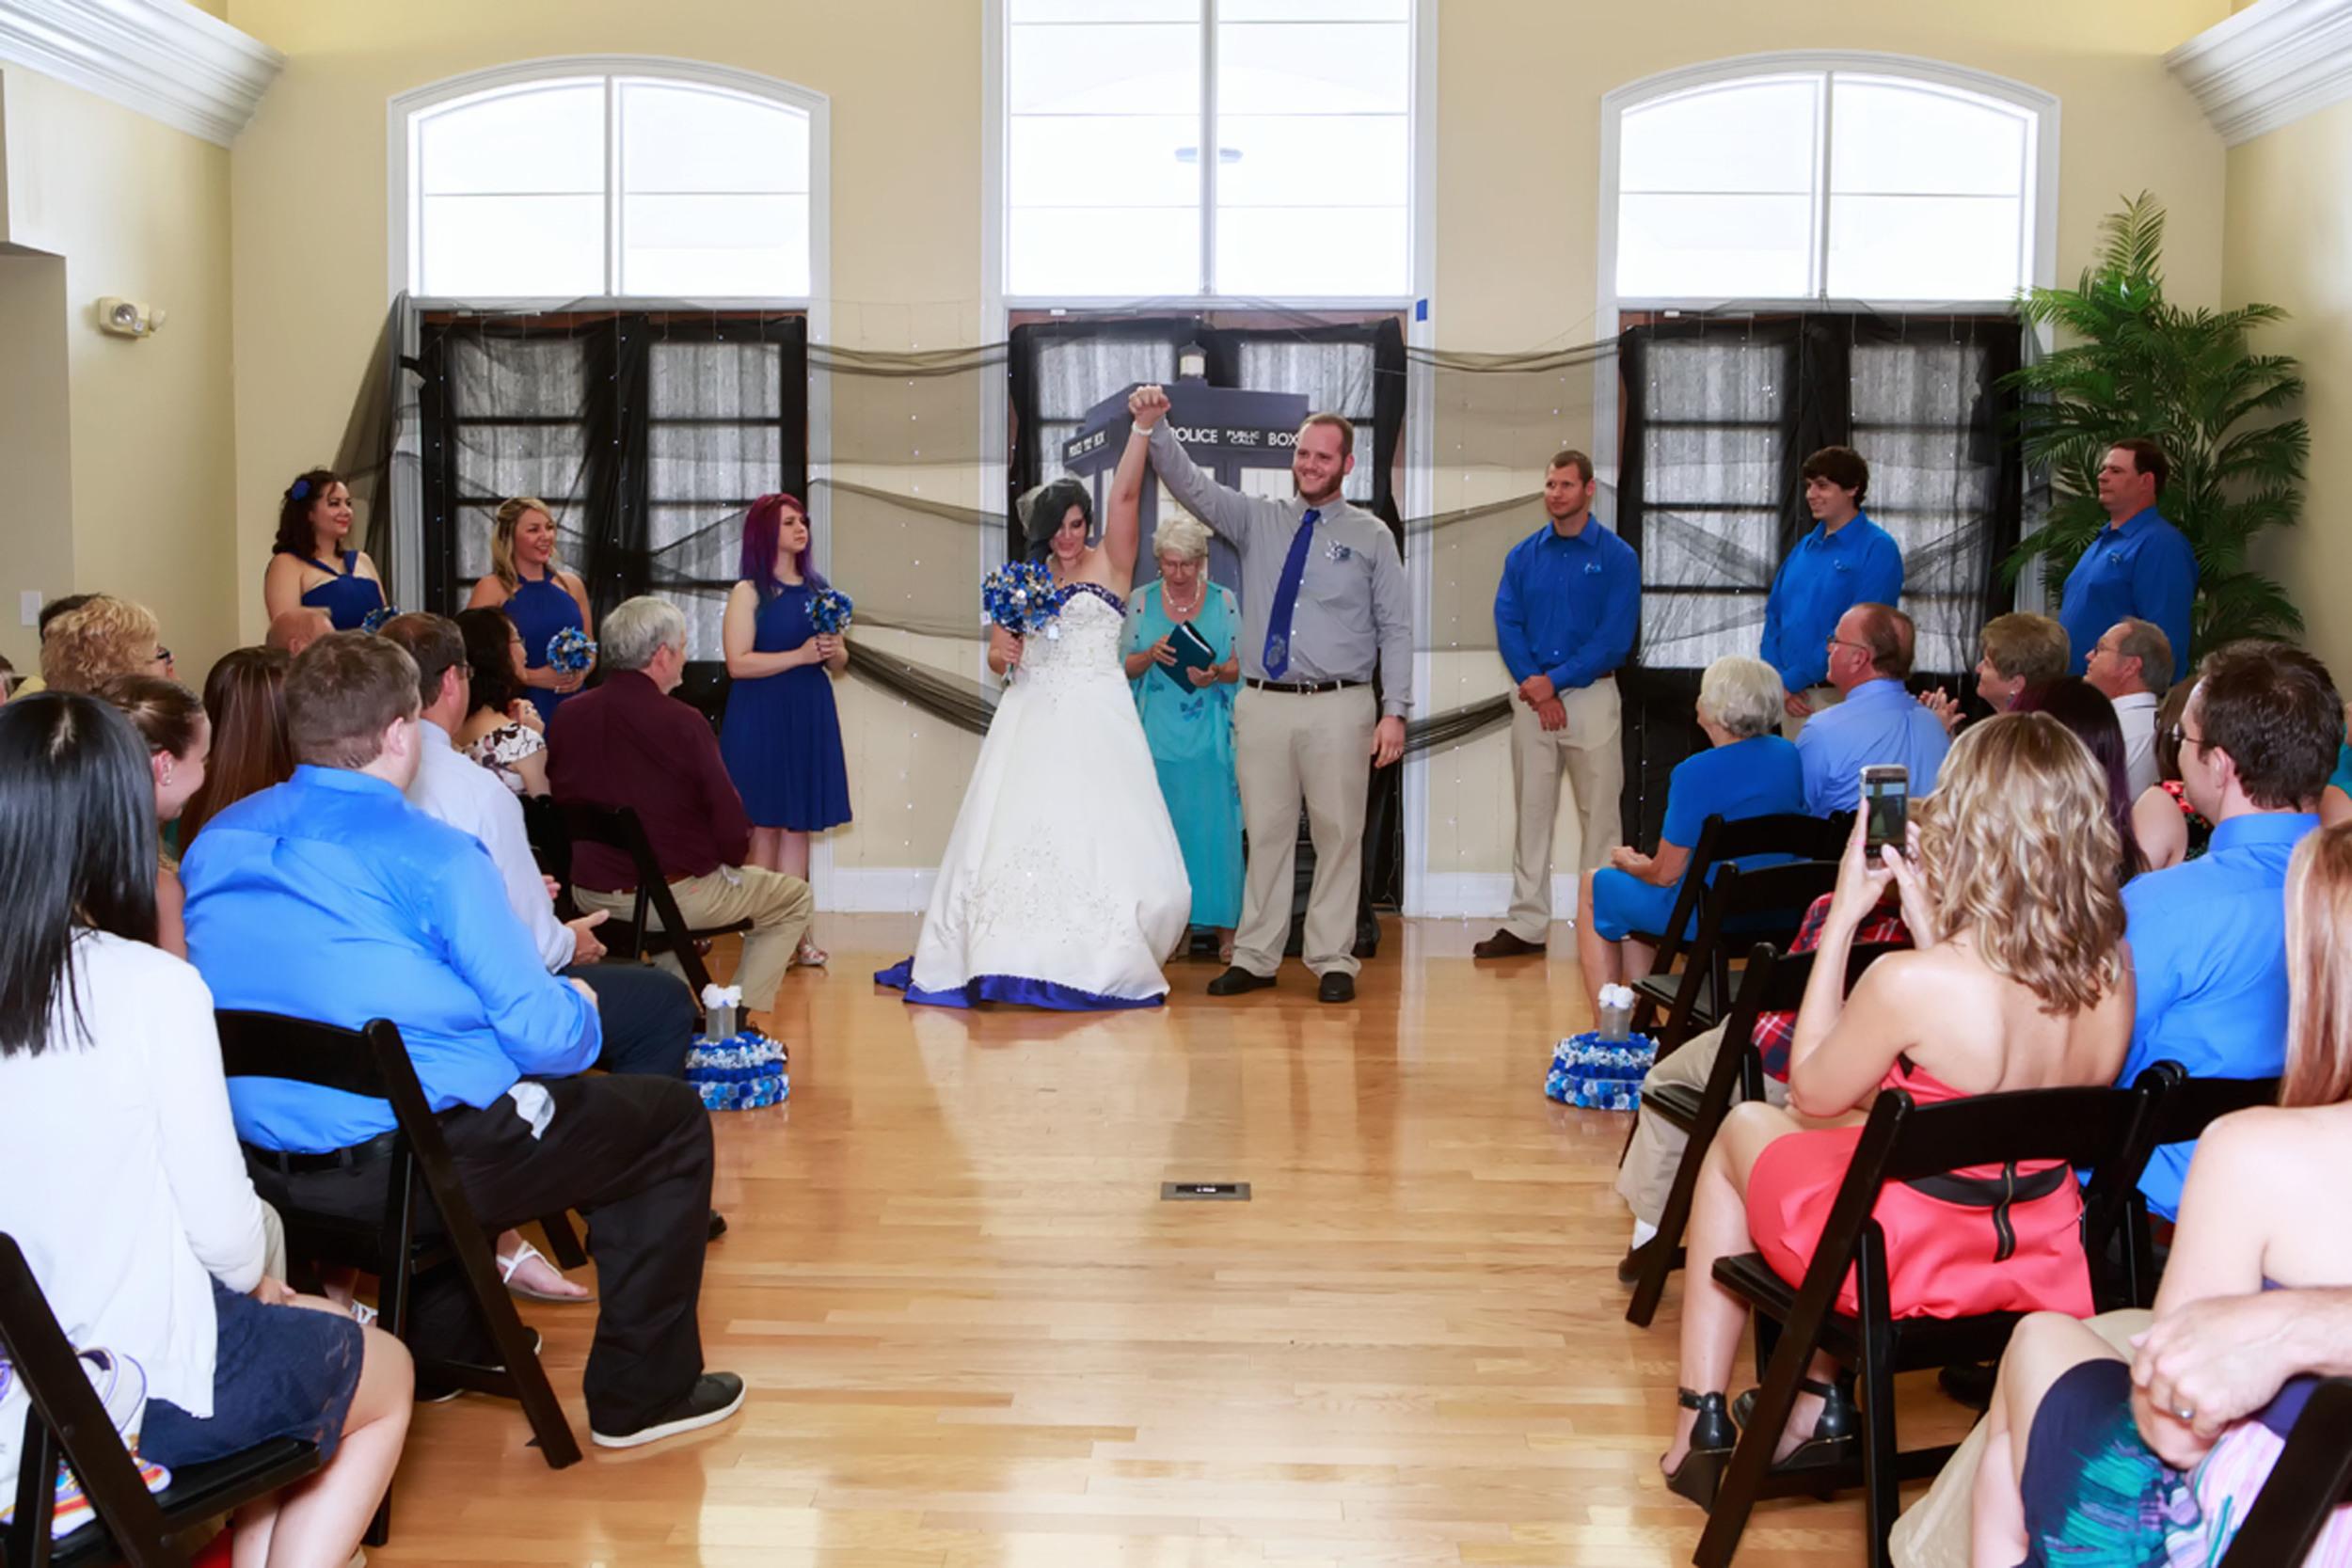 NC_Wedding_Photographer_Tiffany_Abruzzo_Ceremony_52.jpg